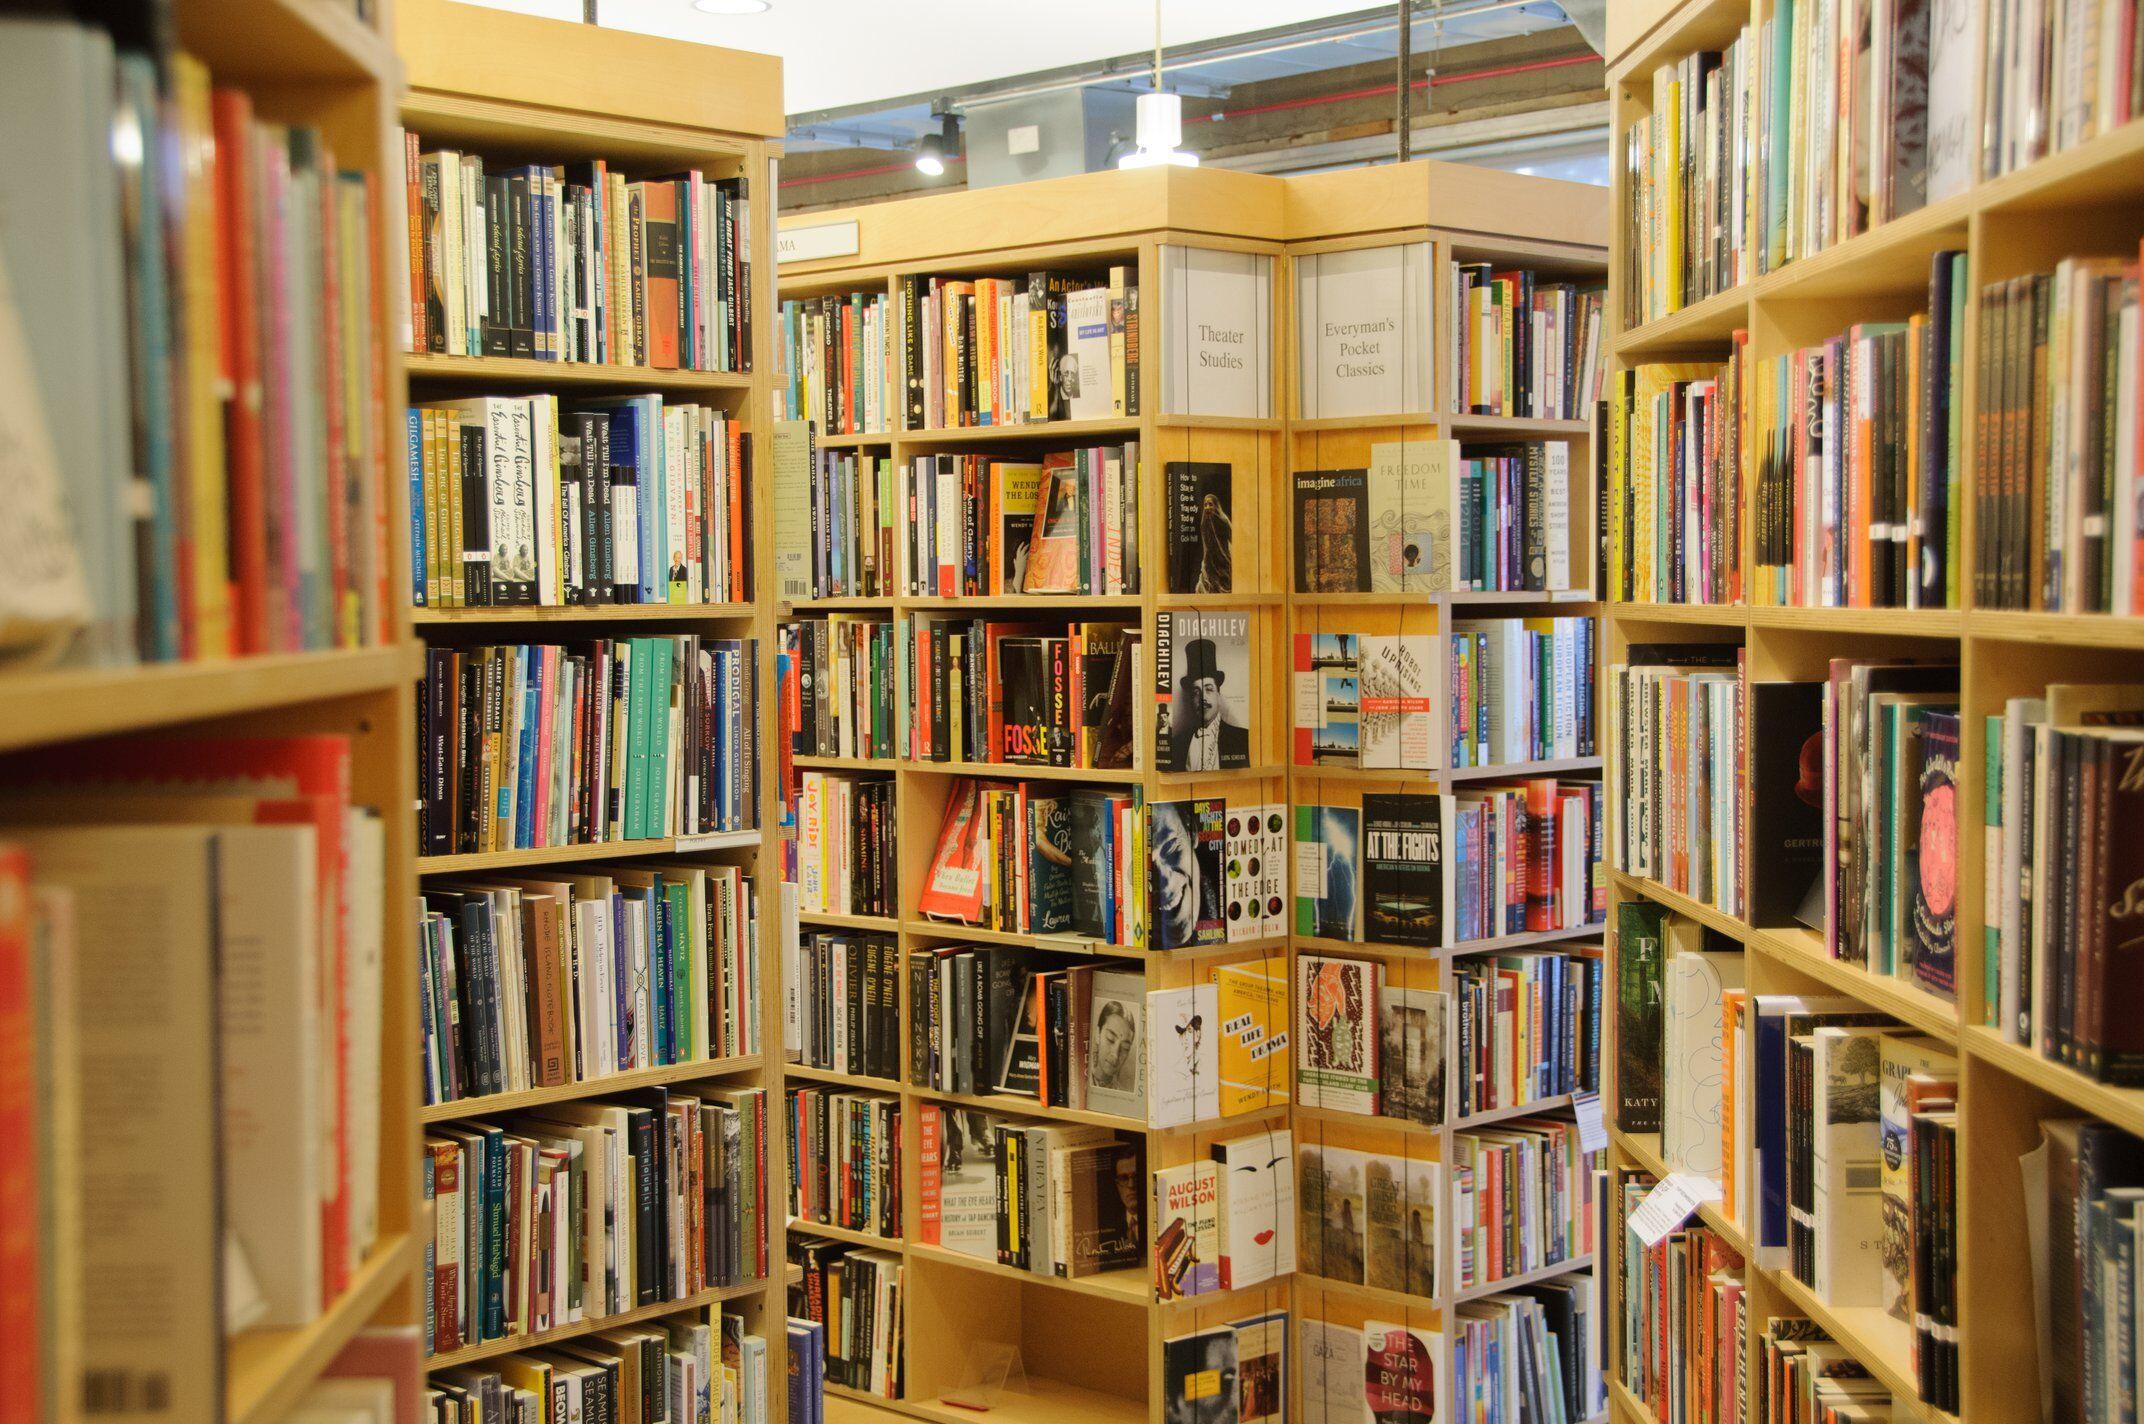 Seminary Co-op Bookstores interior